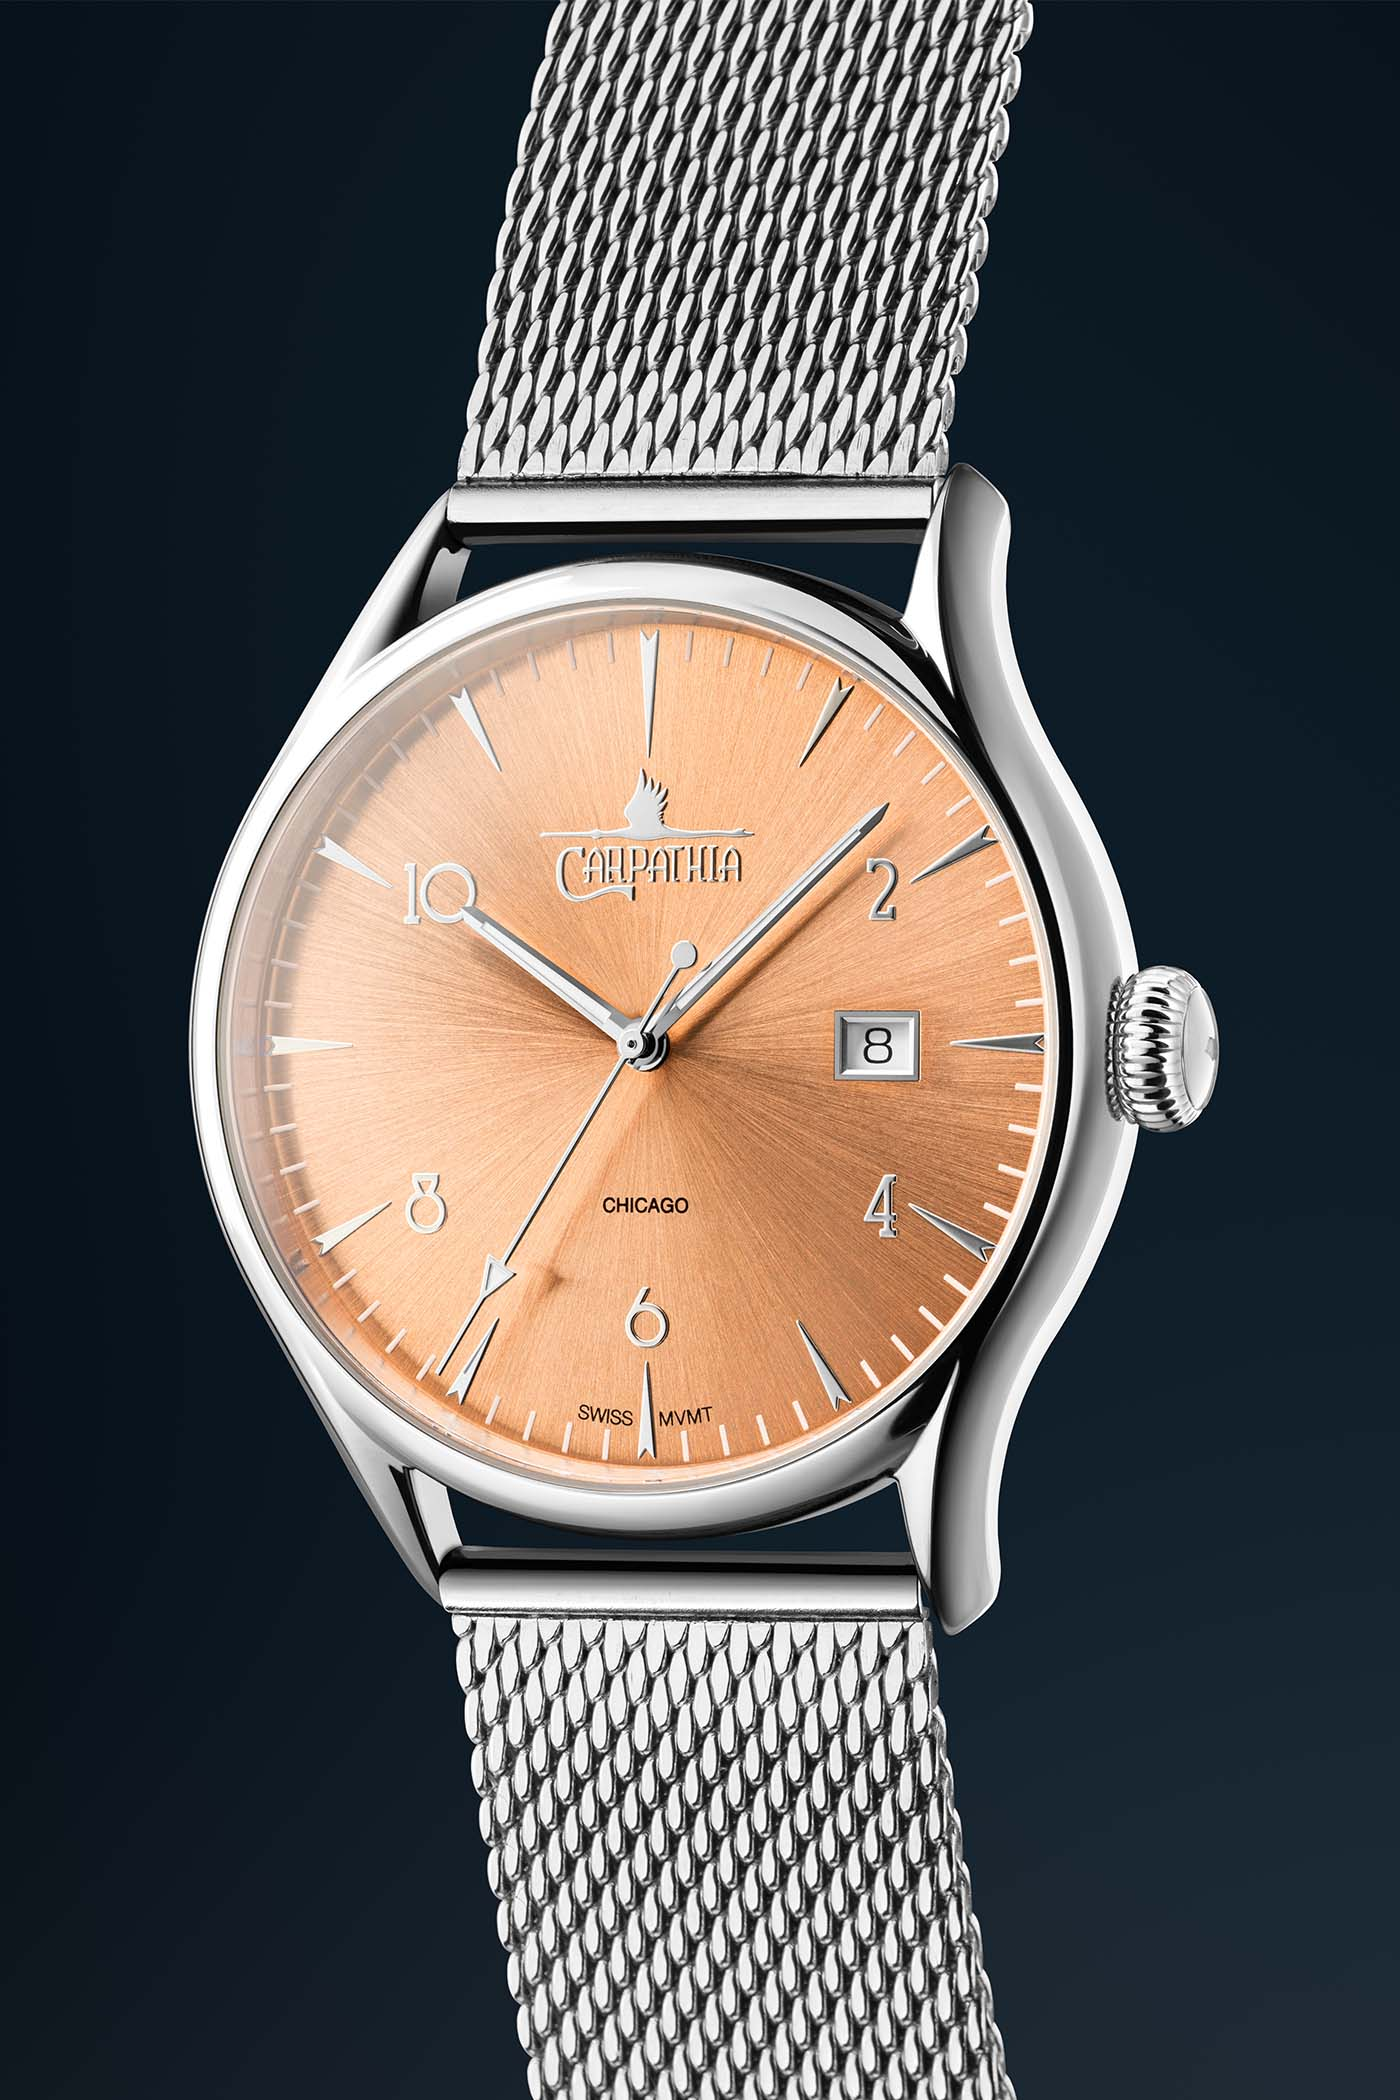 Carpathia Ascent - Value Proposition Kickstarter - 6